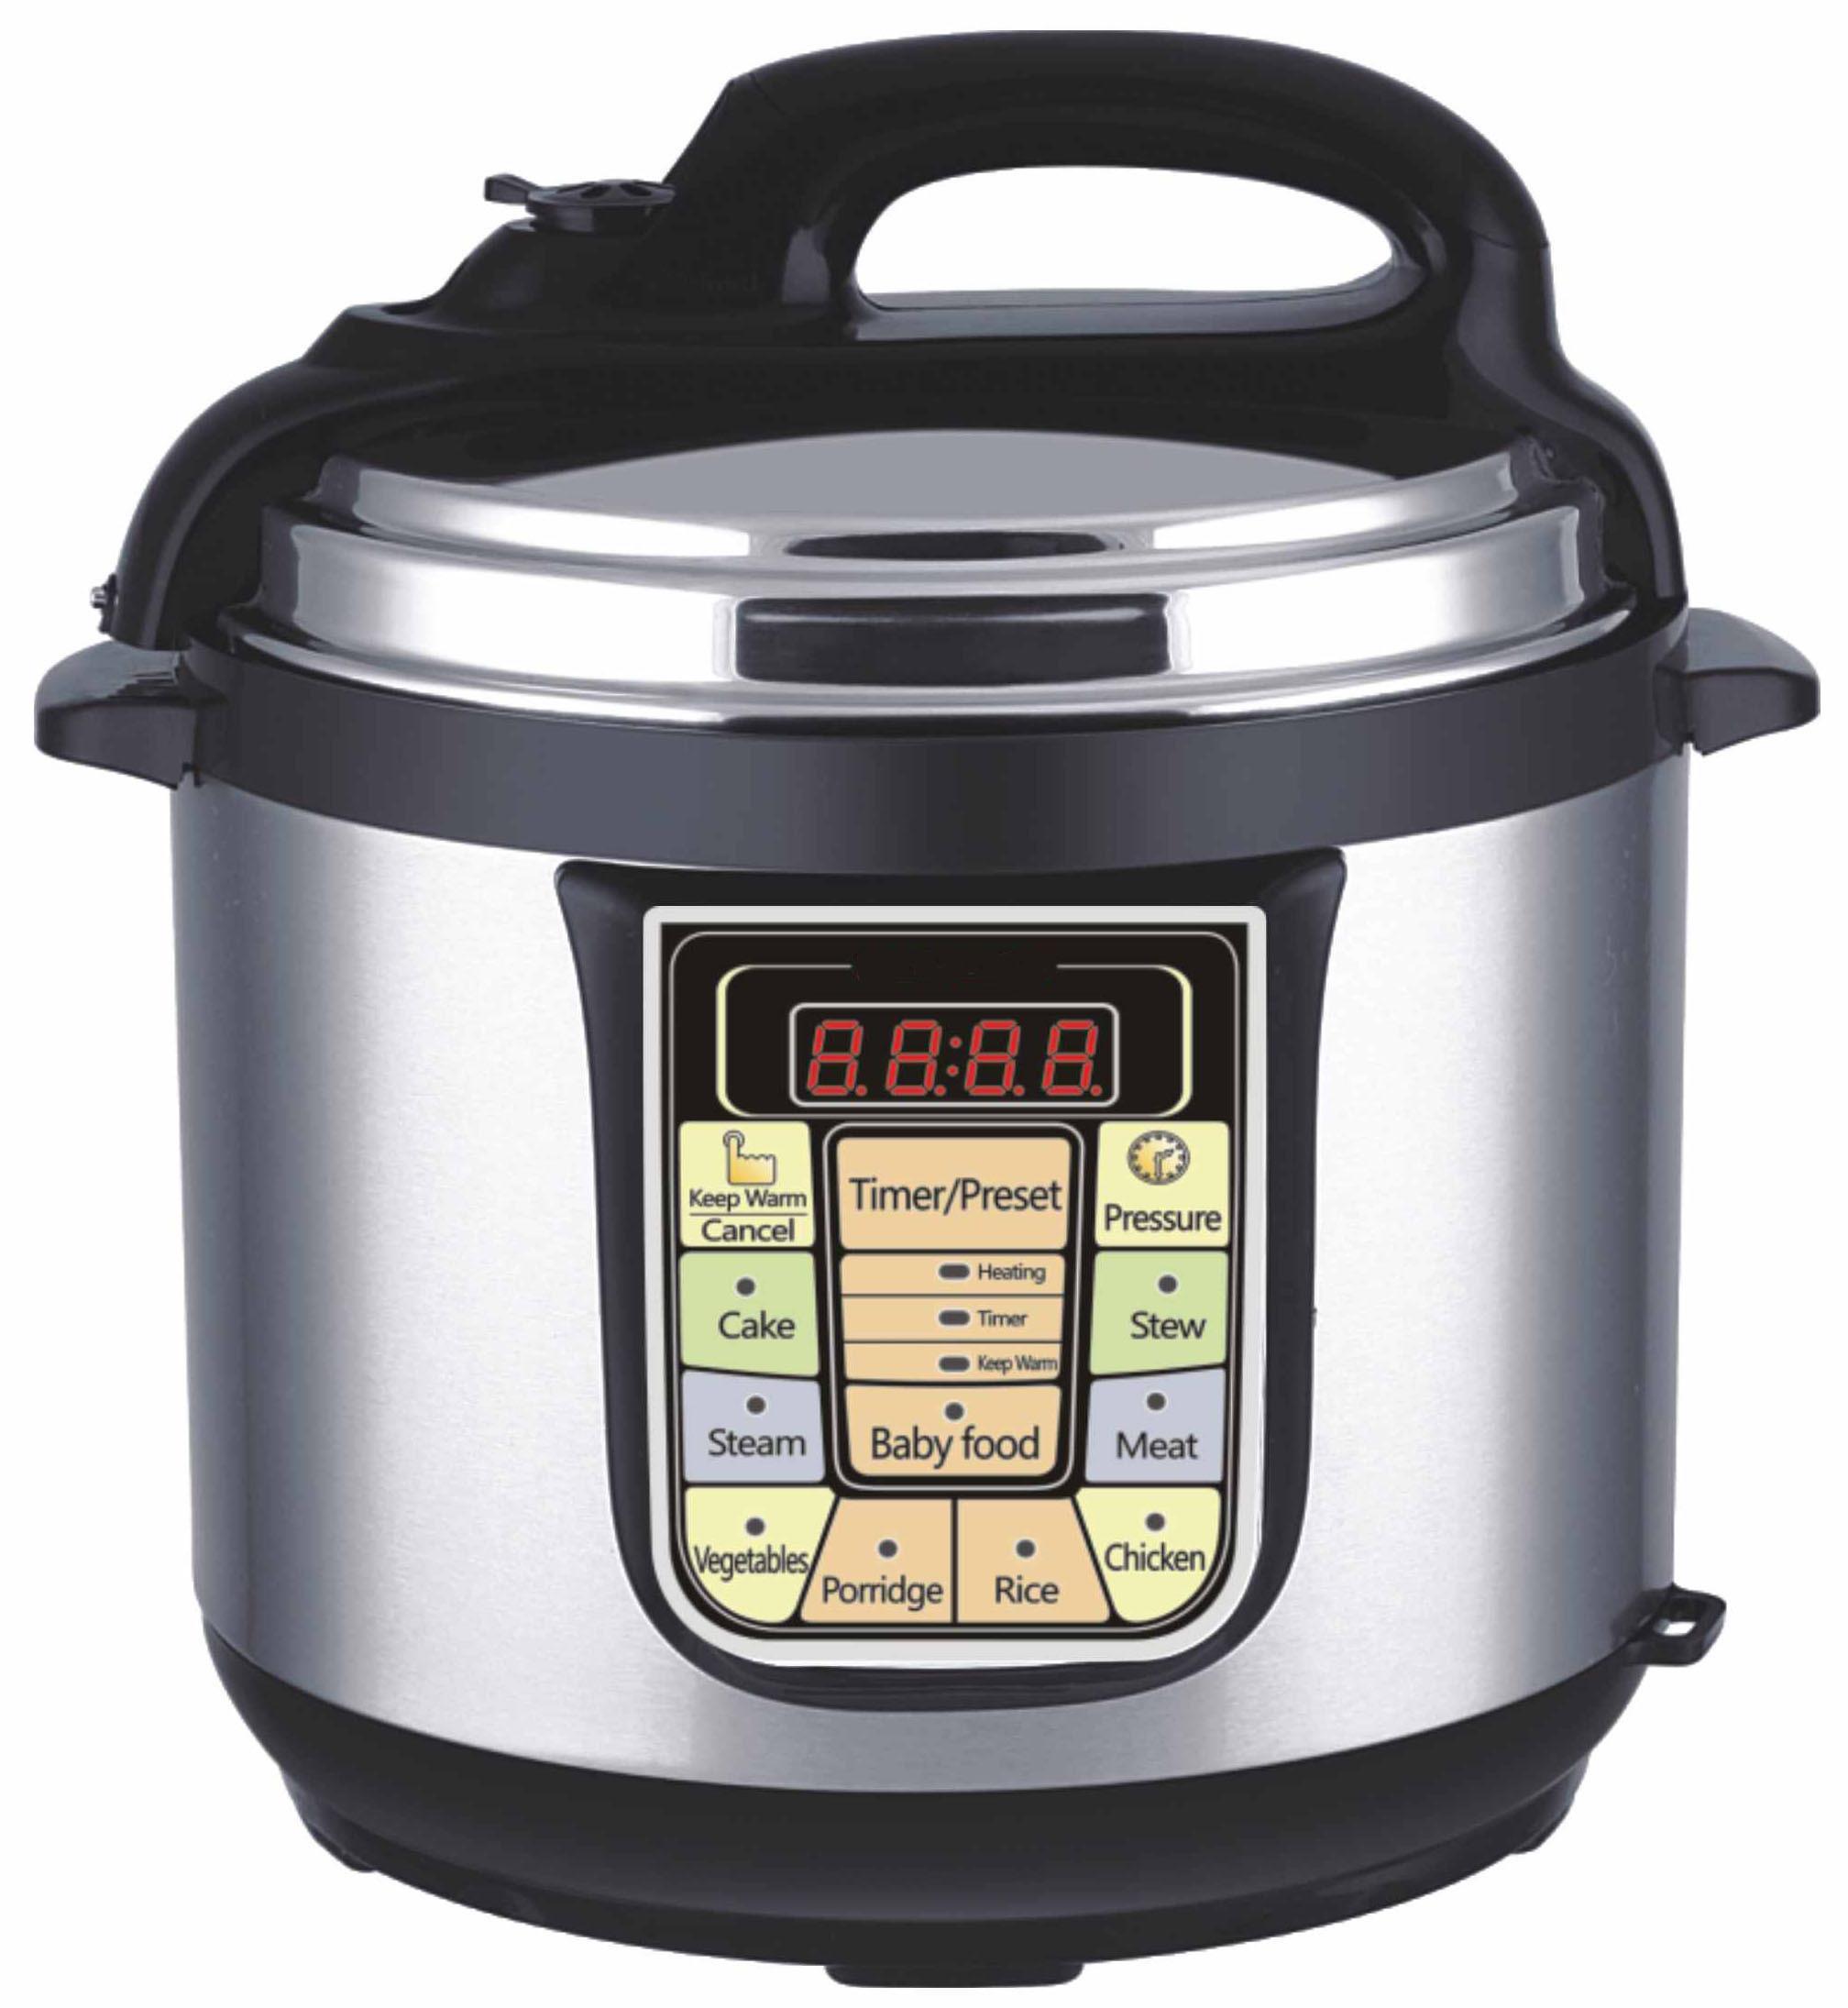 cuisinart electric pressure cooker manual